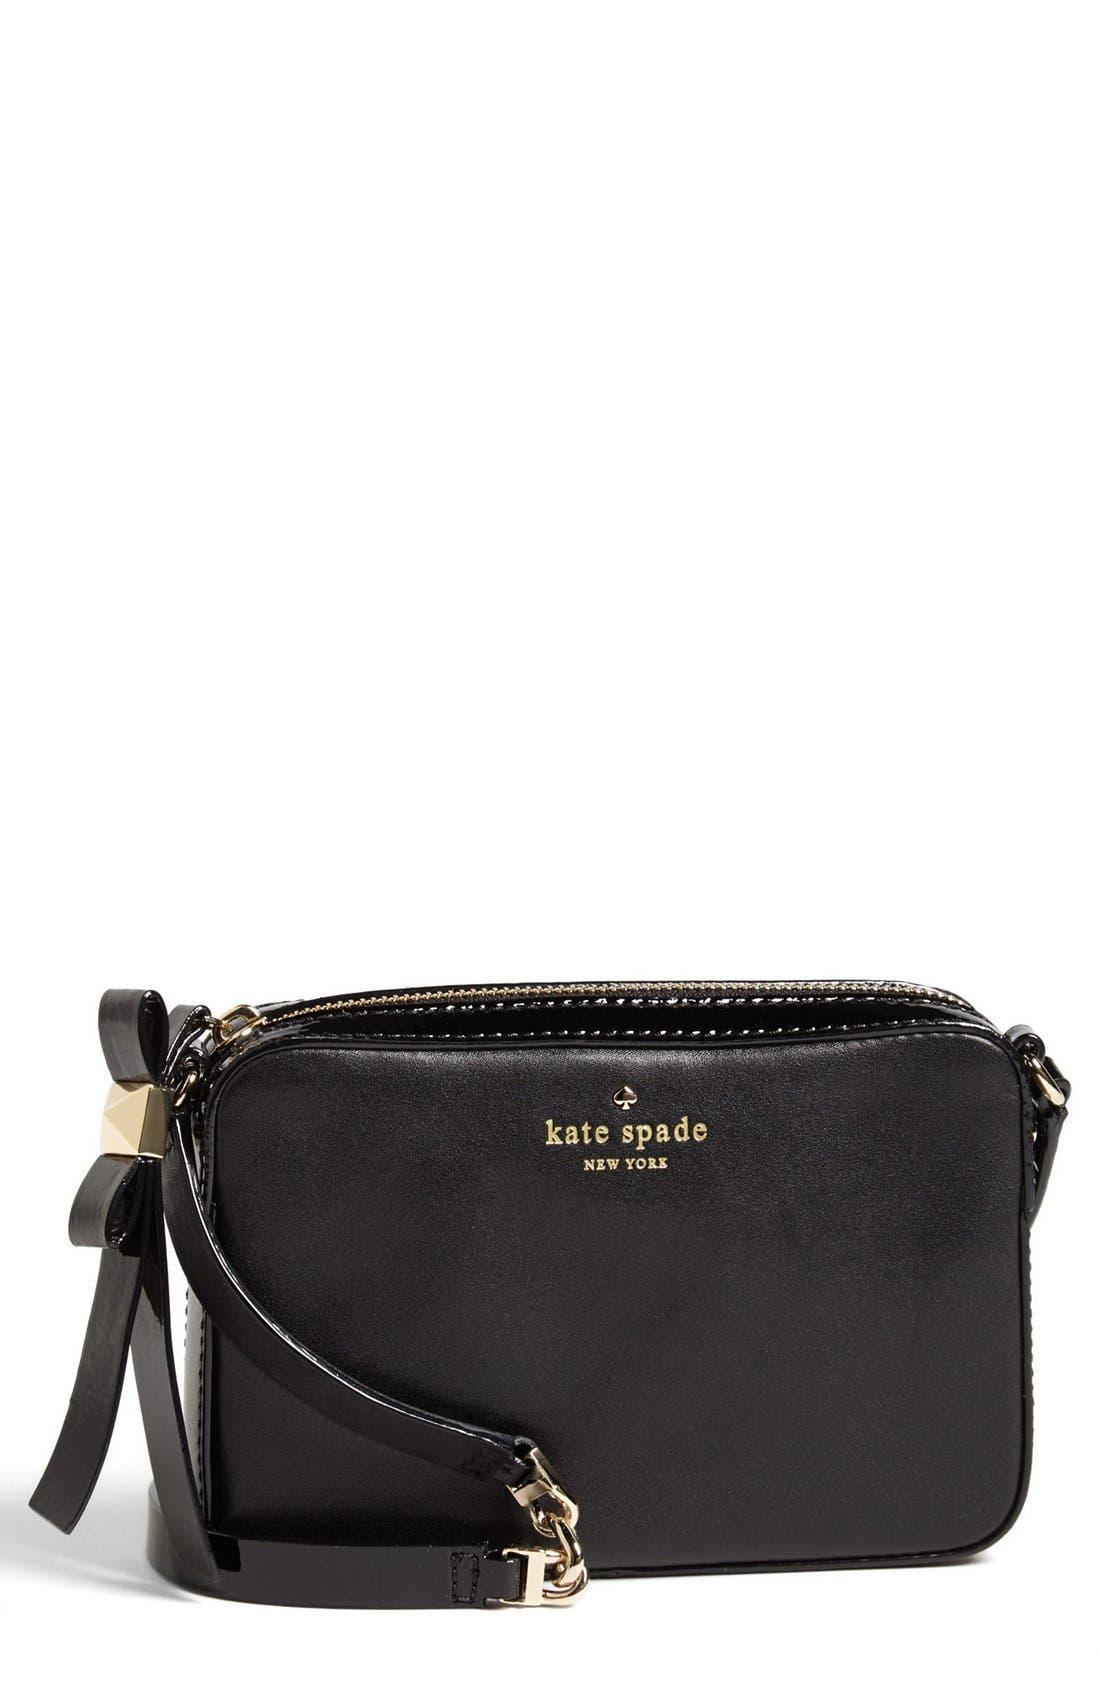 Alternate Image 1 Selected - kate spade new york 'clover' leather crossbody bag